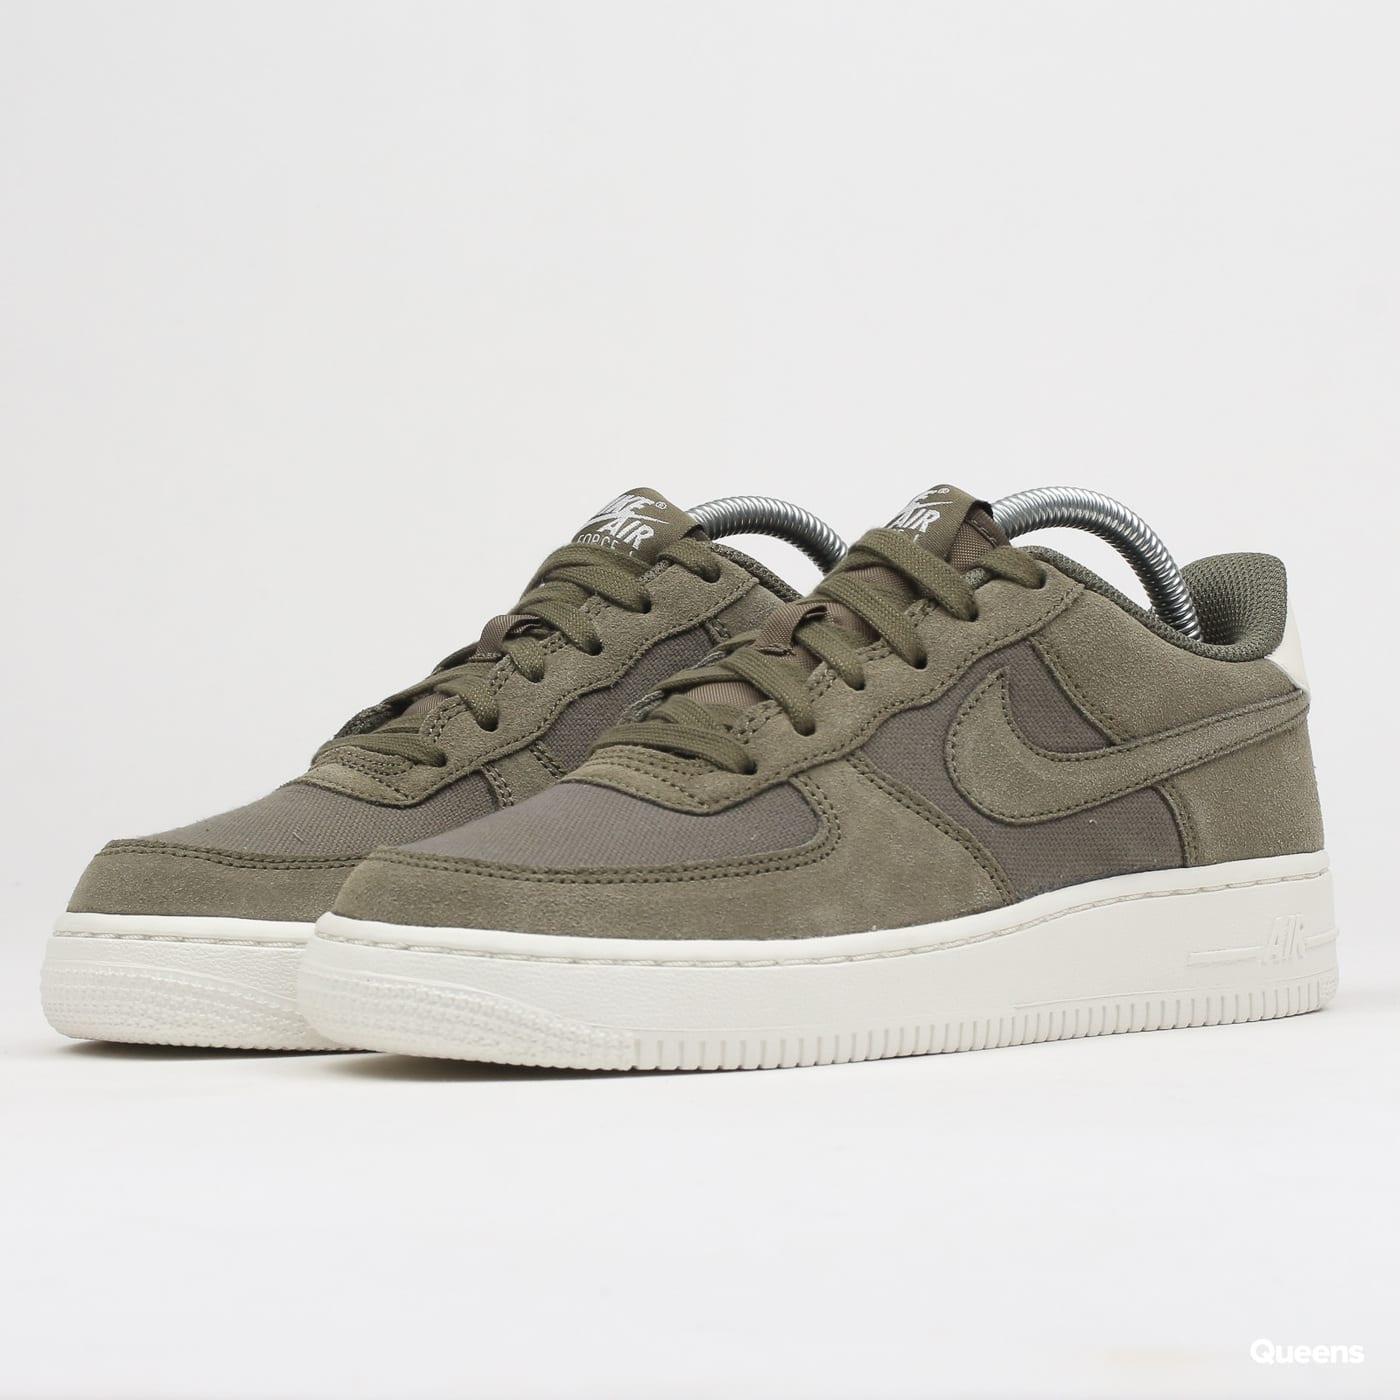 2d11a3358ac Nike Air Force 1 Suede (GS) (AR0265-200) – Queens 💚